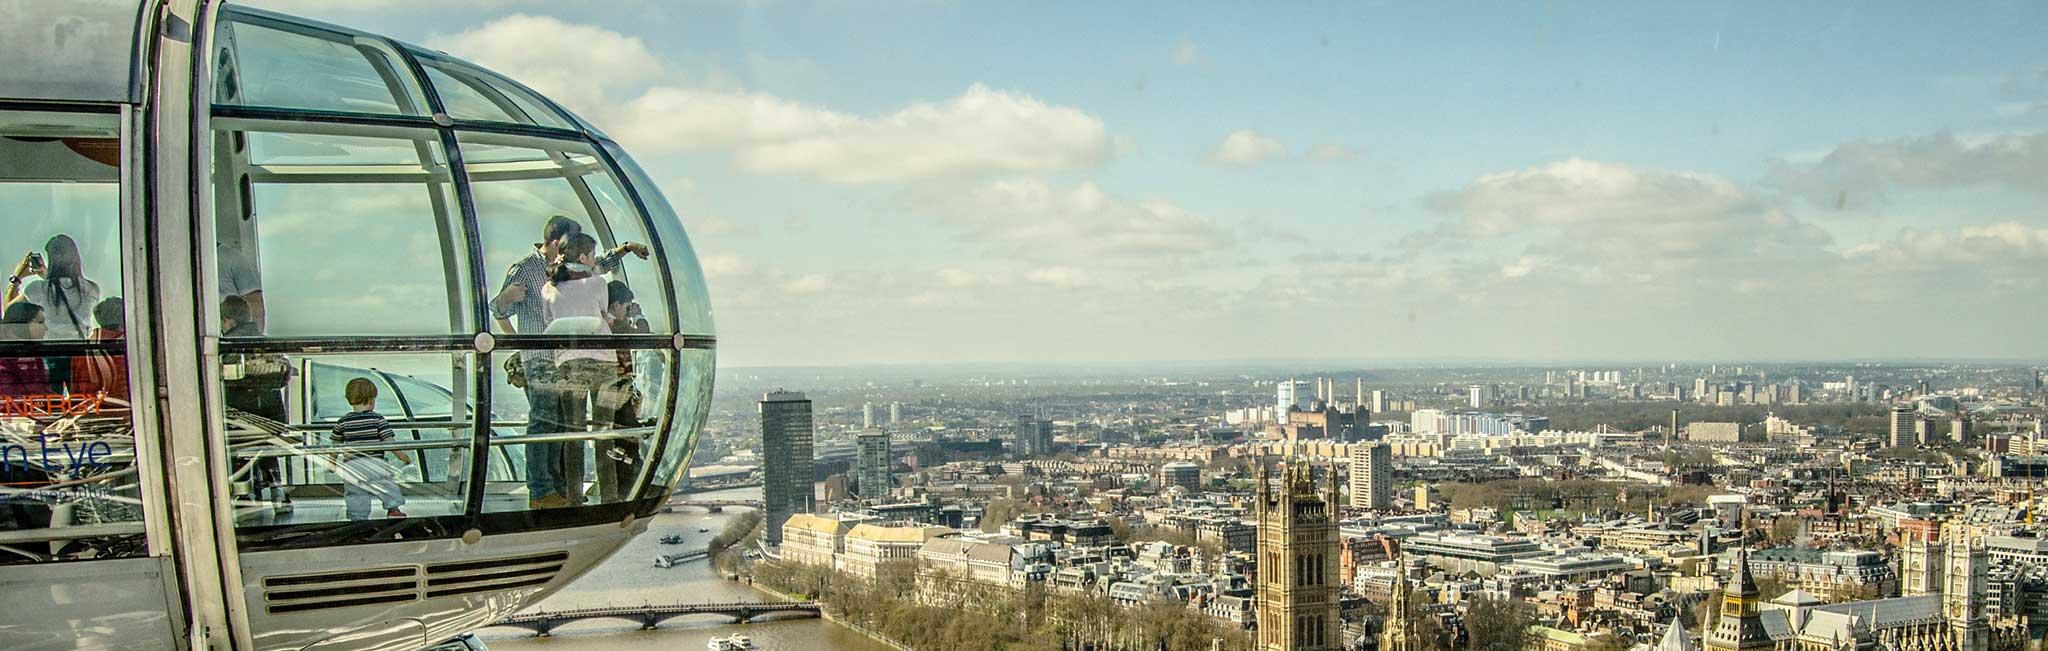 Family Tours - View from London Eye Pod